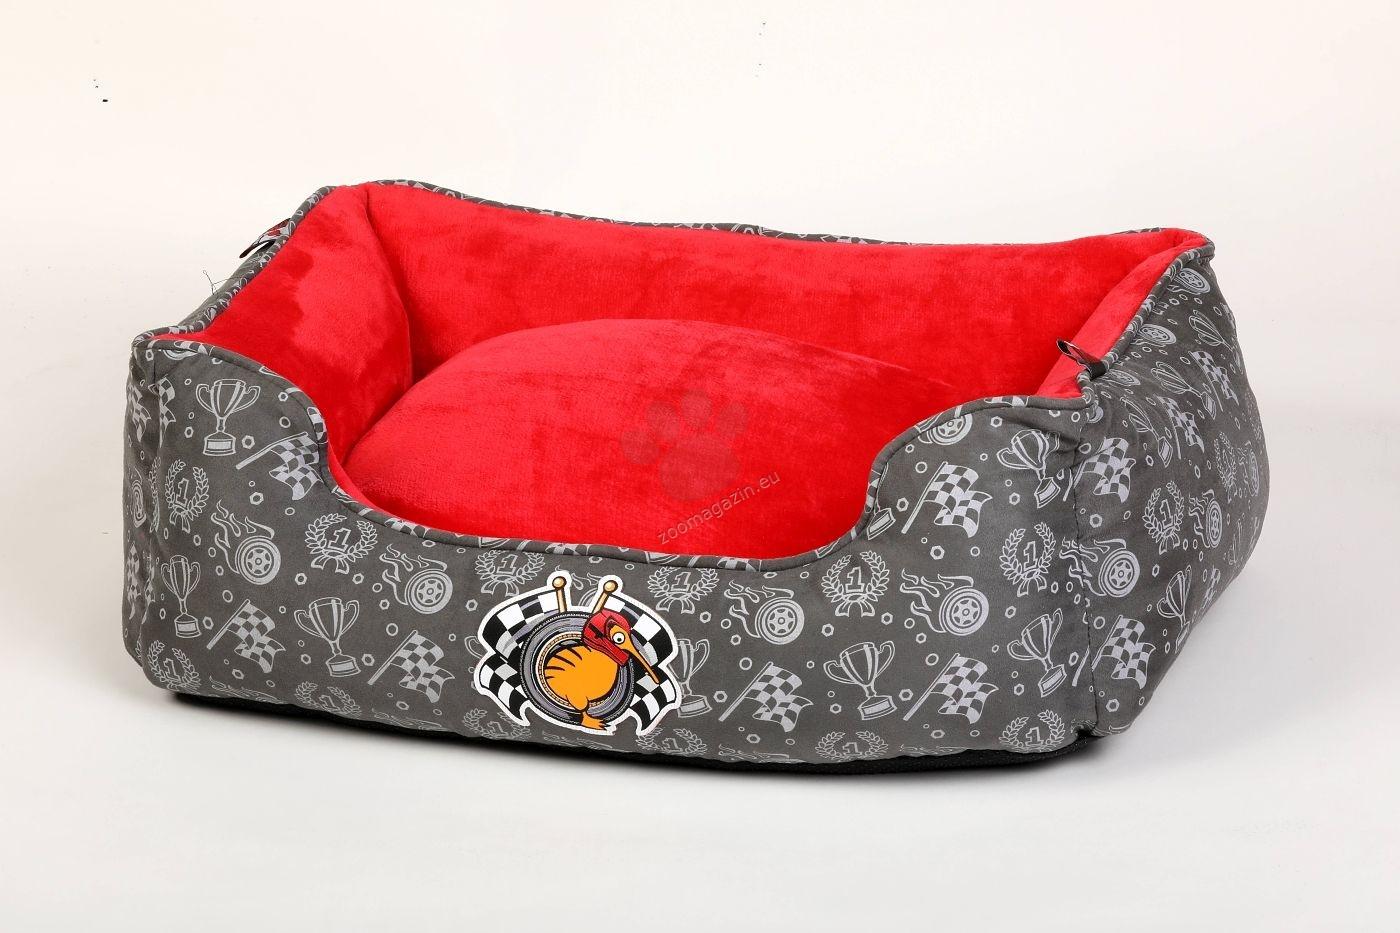 Kiwi Walker Bed Border Racer/Sailor XL - ортопедично легло с мемори пяна 95 / 65 / 26 см. / червен, син /